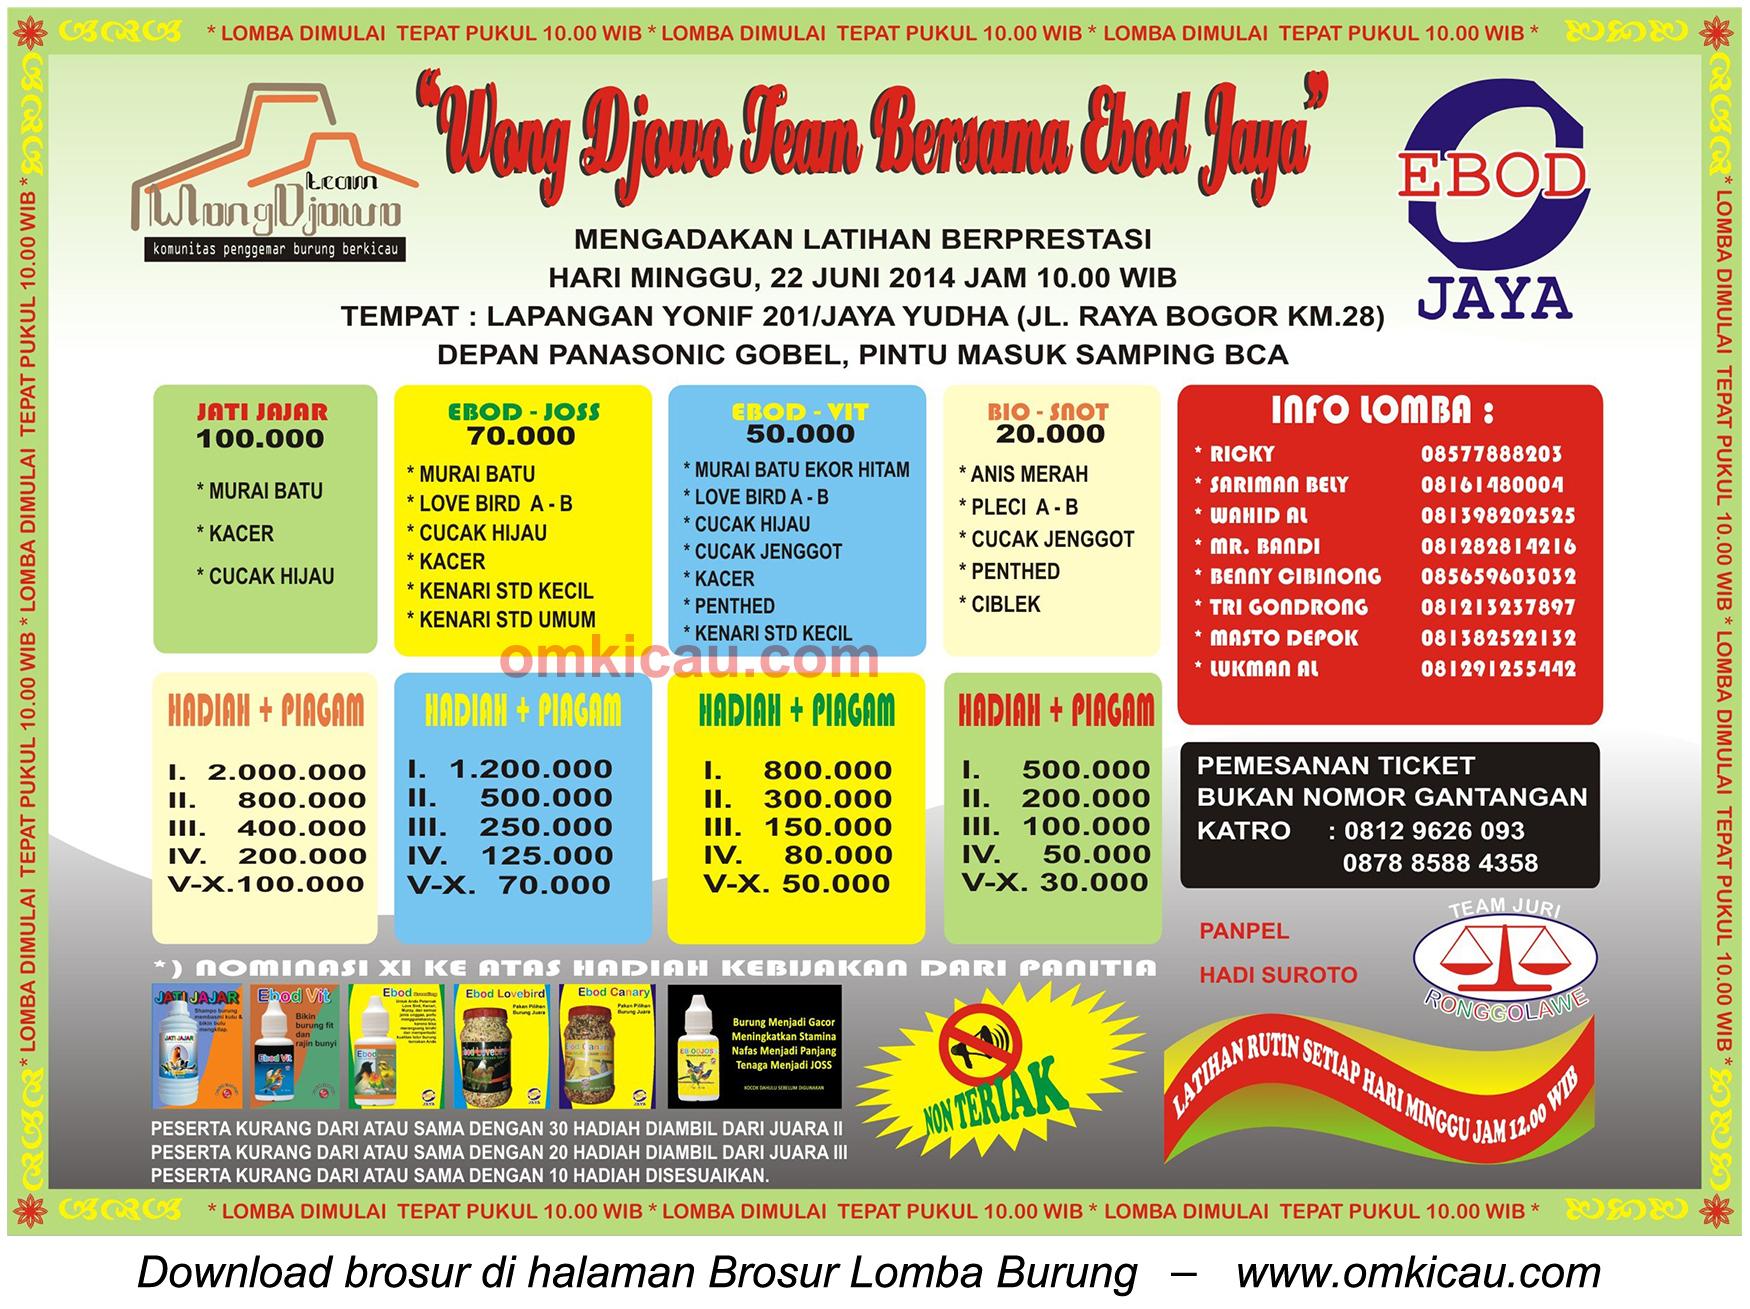 Brosur Latpres Wong Djowo Team, Jakarta Timur, 22 Juni 2014